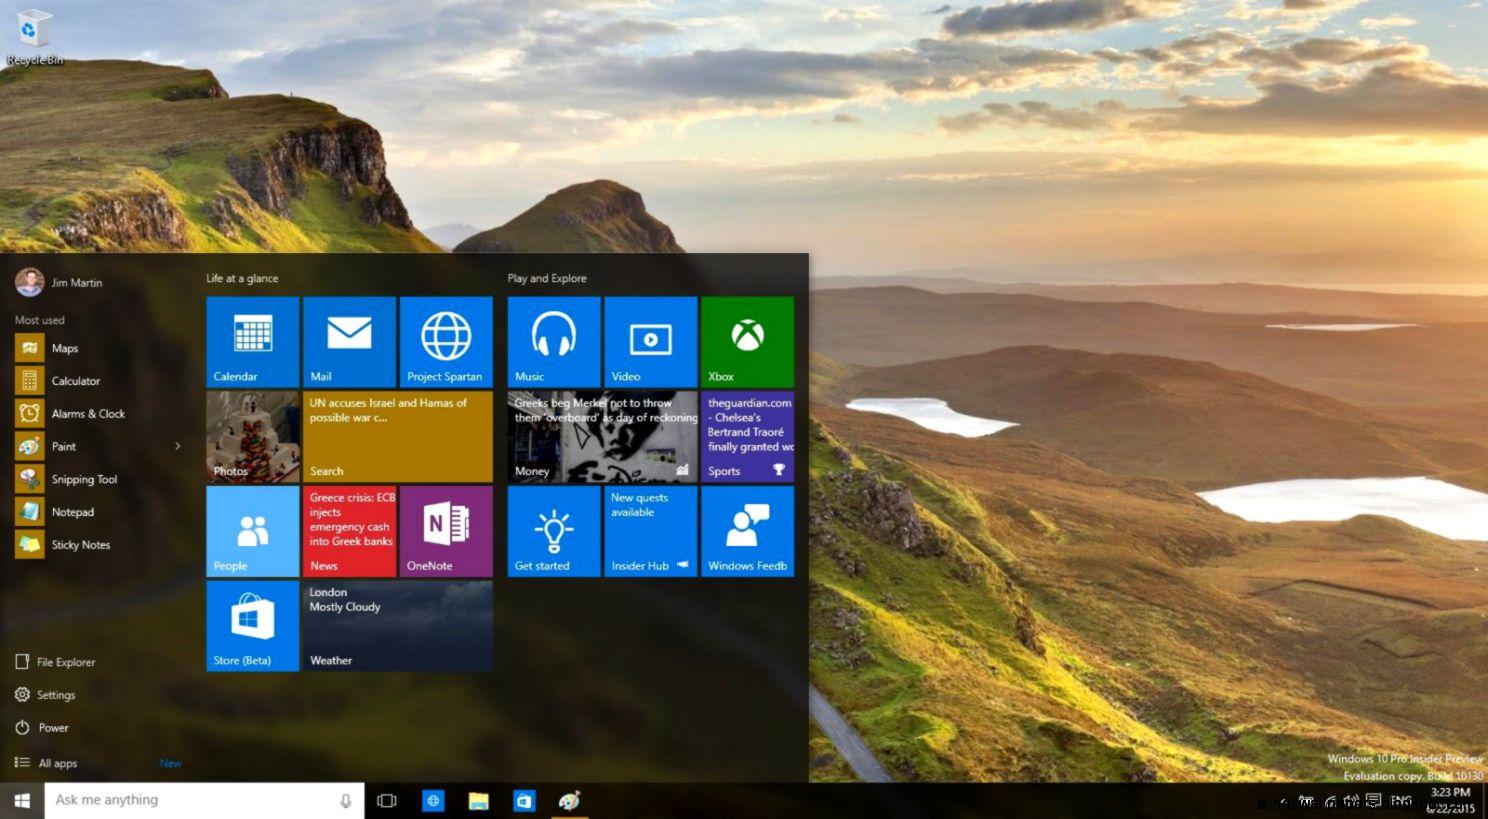 Windows 7 vs Windows 10 comparison Whats the difference